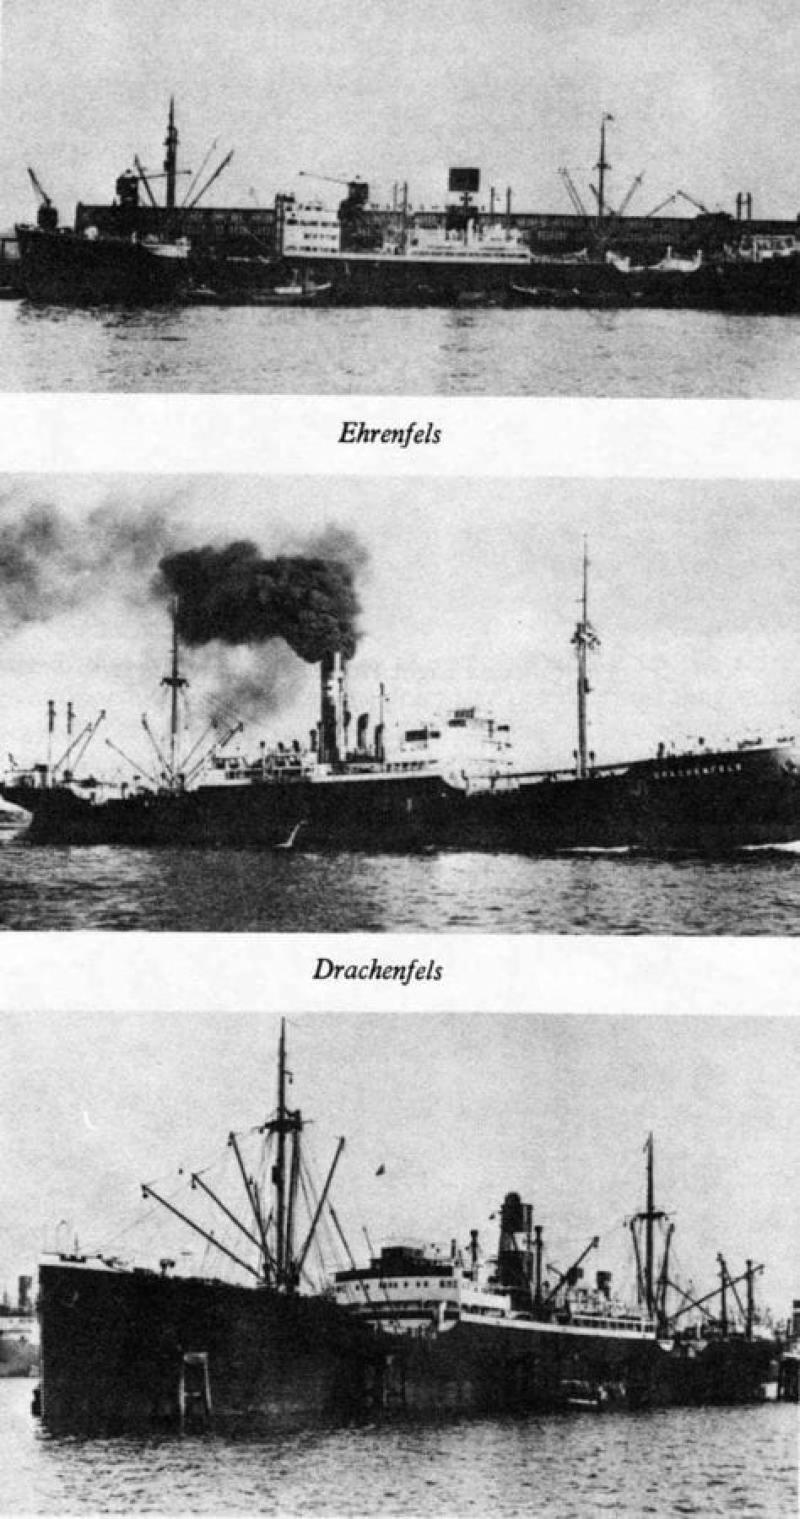 The three German merchantmen who took refuge in Mormugao, Goa, after the outbreak of World War II. The Ehrenfels was the target of the raid. Photo courtesy of Arnhemjim